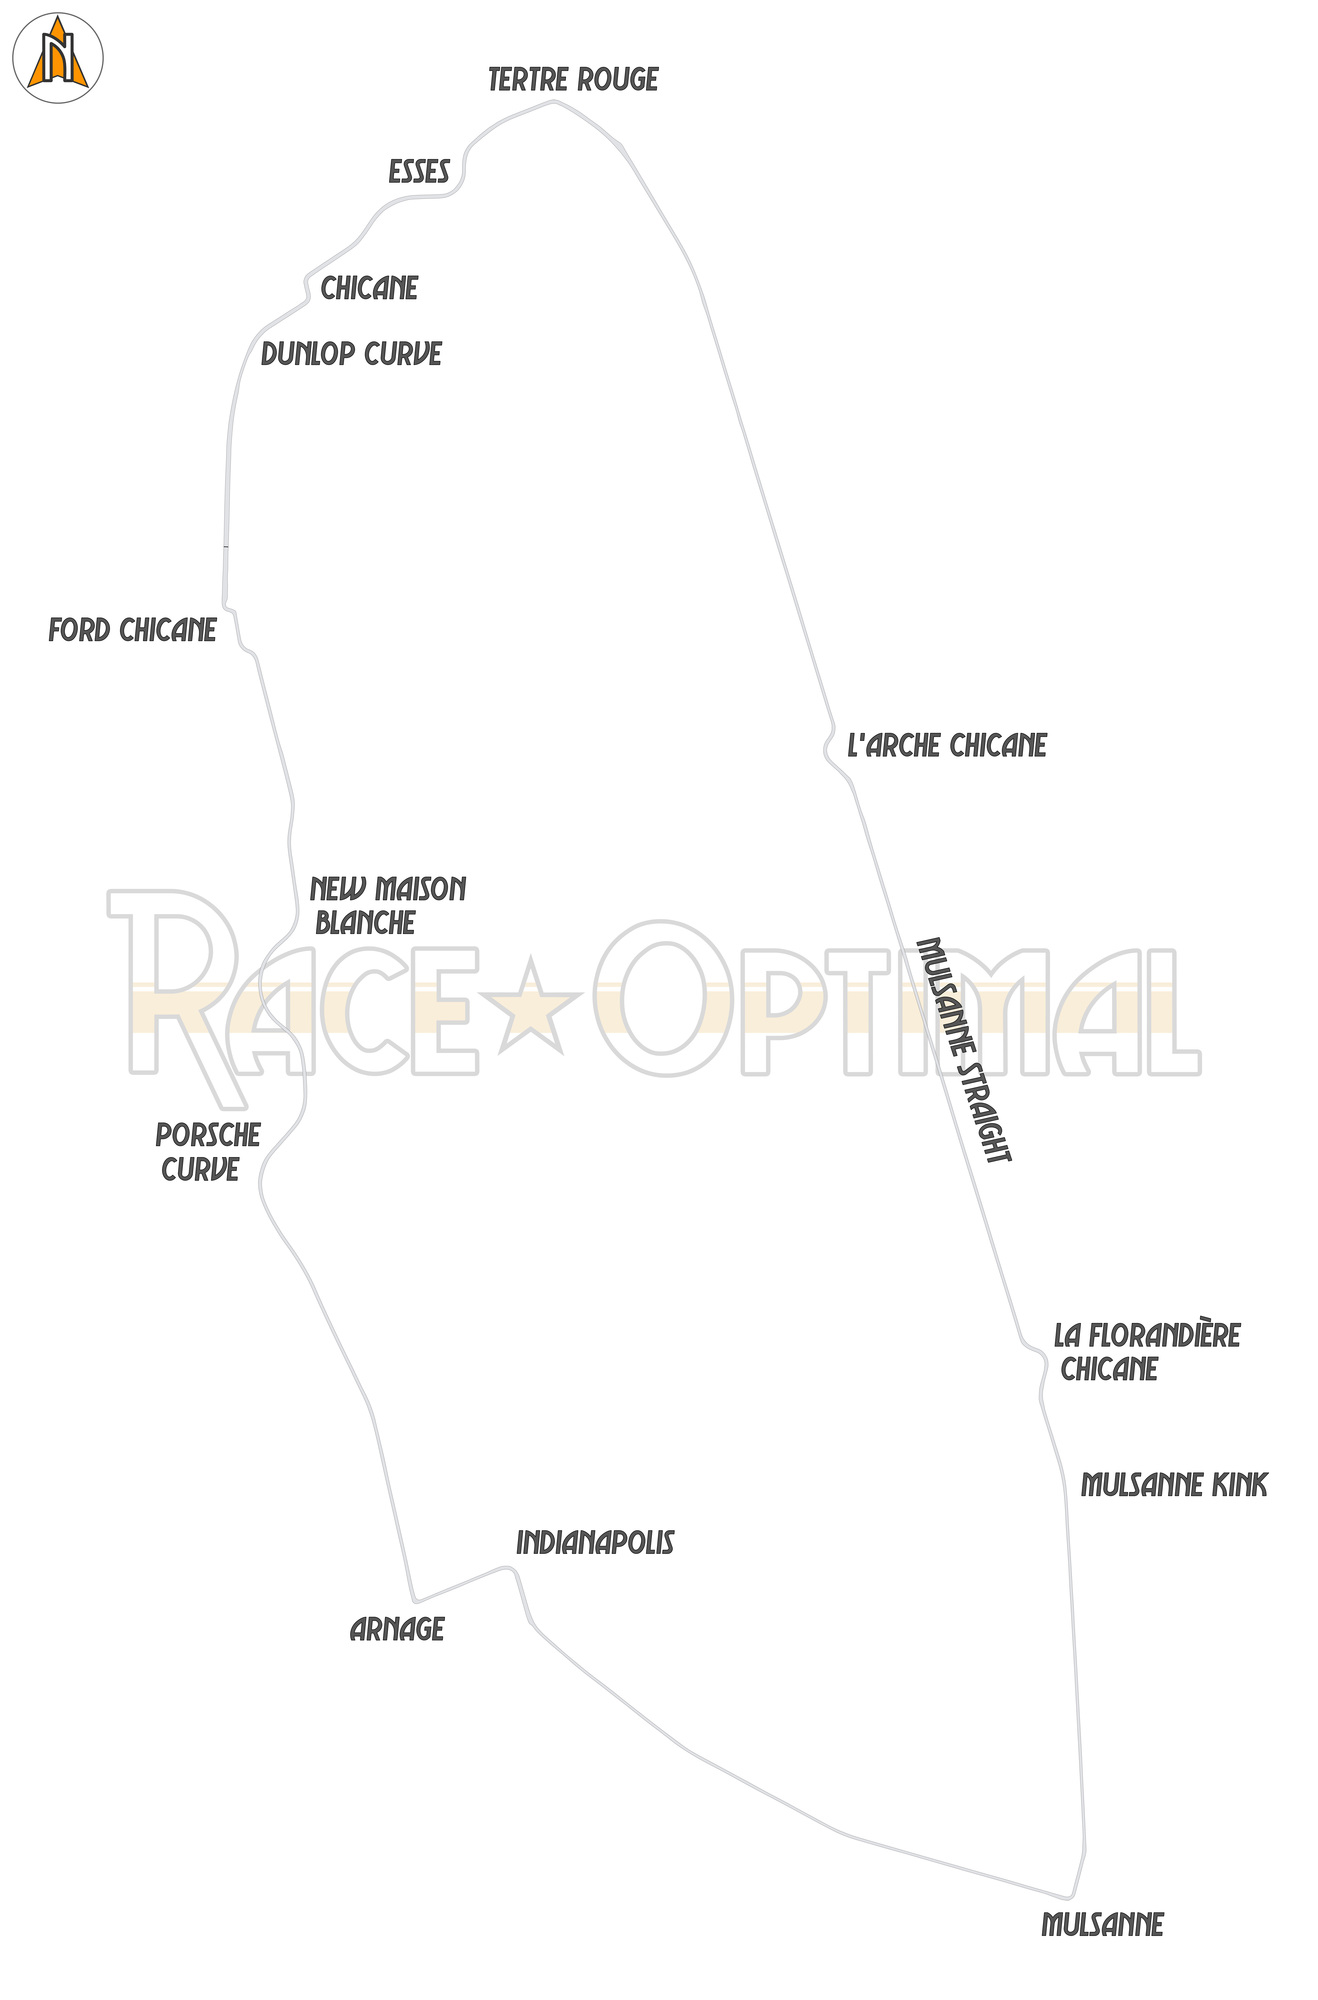 racing line map at circuit de la sarthe le mans 24 hours. Black Bedroom Furniture Sets. Home Design Ideas